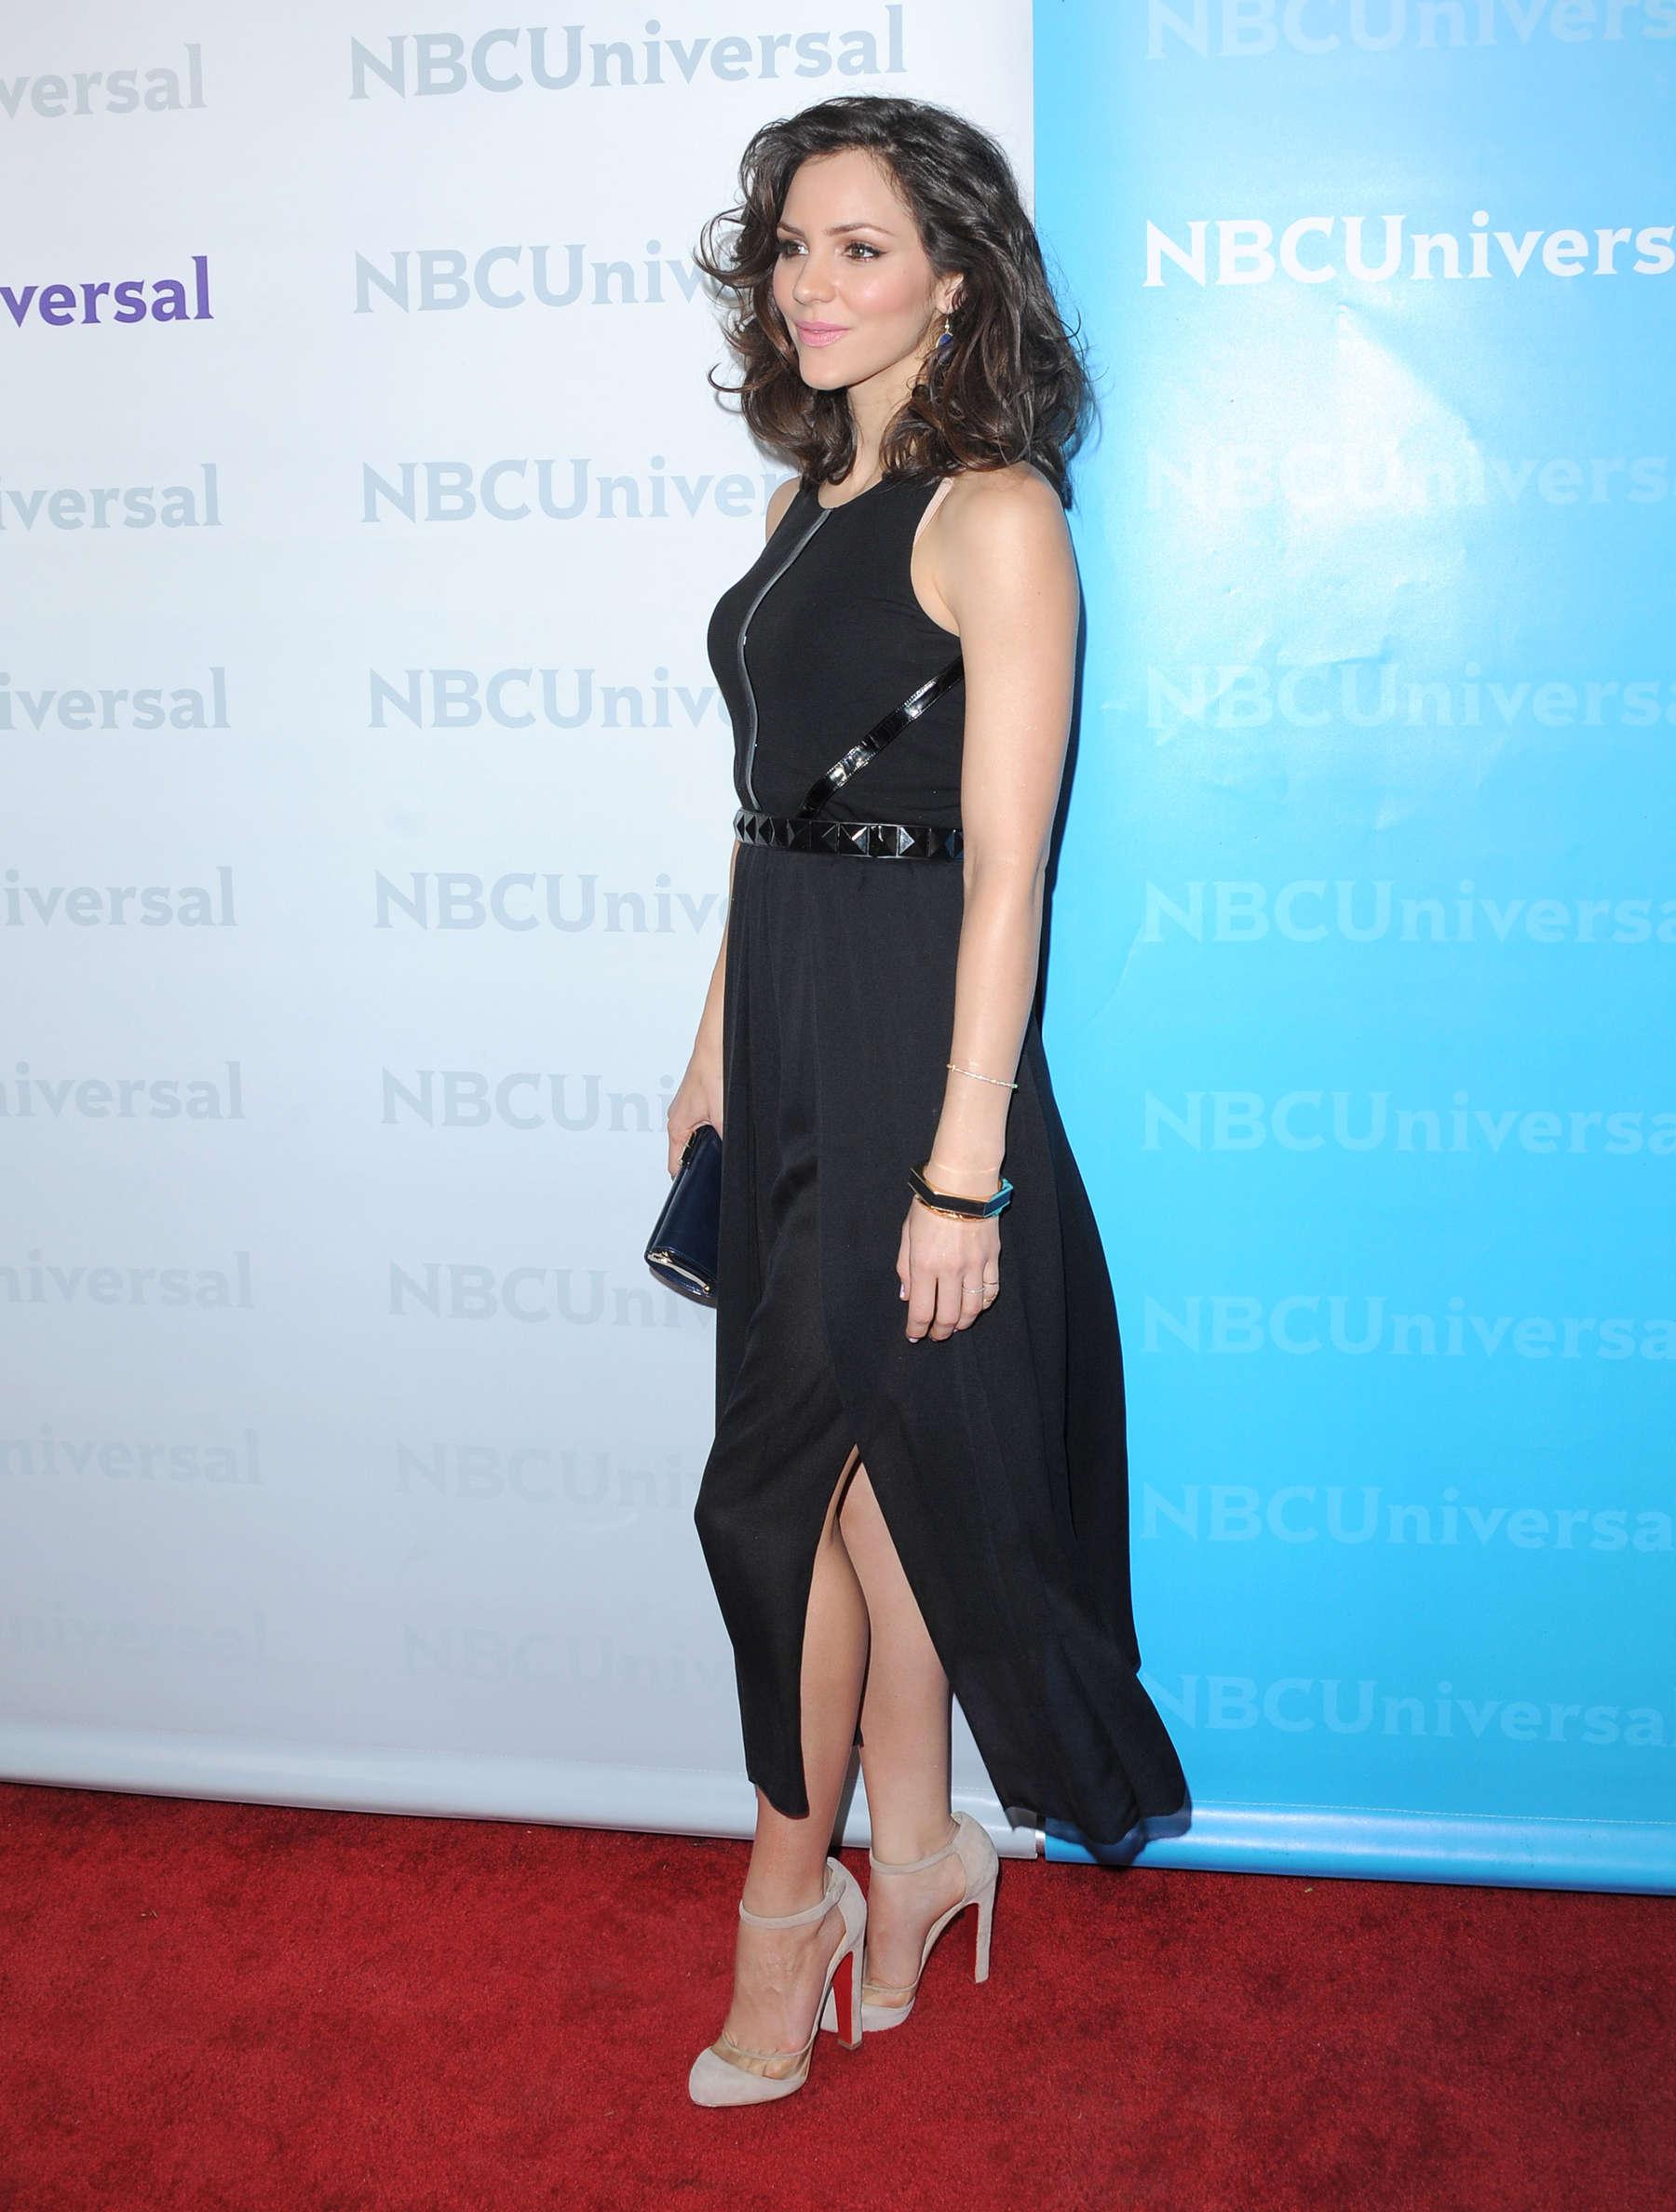 Katharine McPhee - Black Dress at NBC Universal 2012 Winter TCA ...